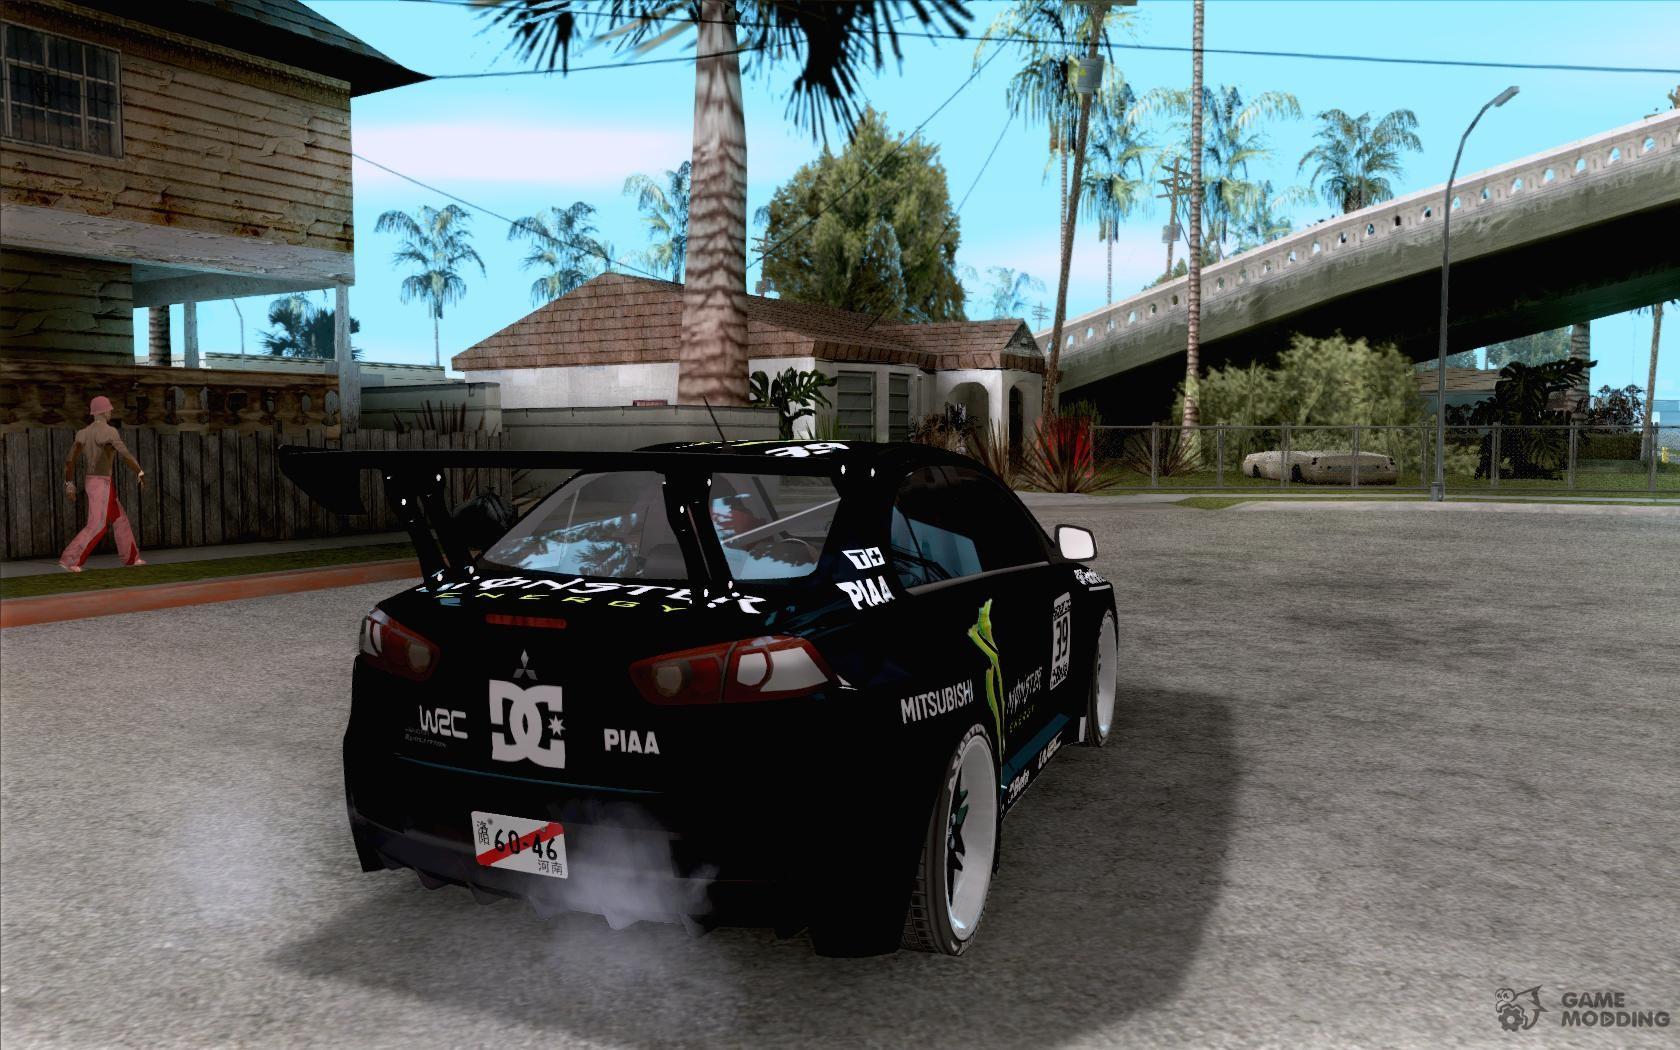 Mitsubishi Lancer Evolution X Monster Energy For GTA San Andreas Top View